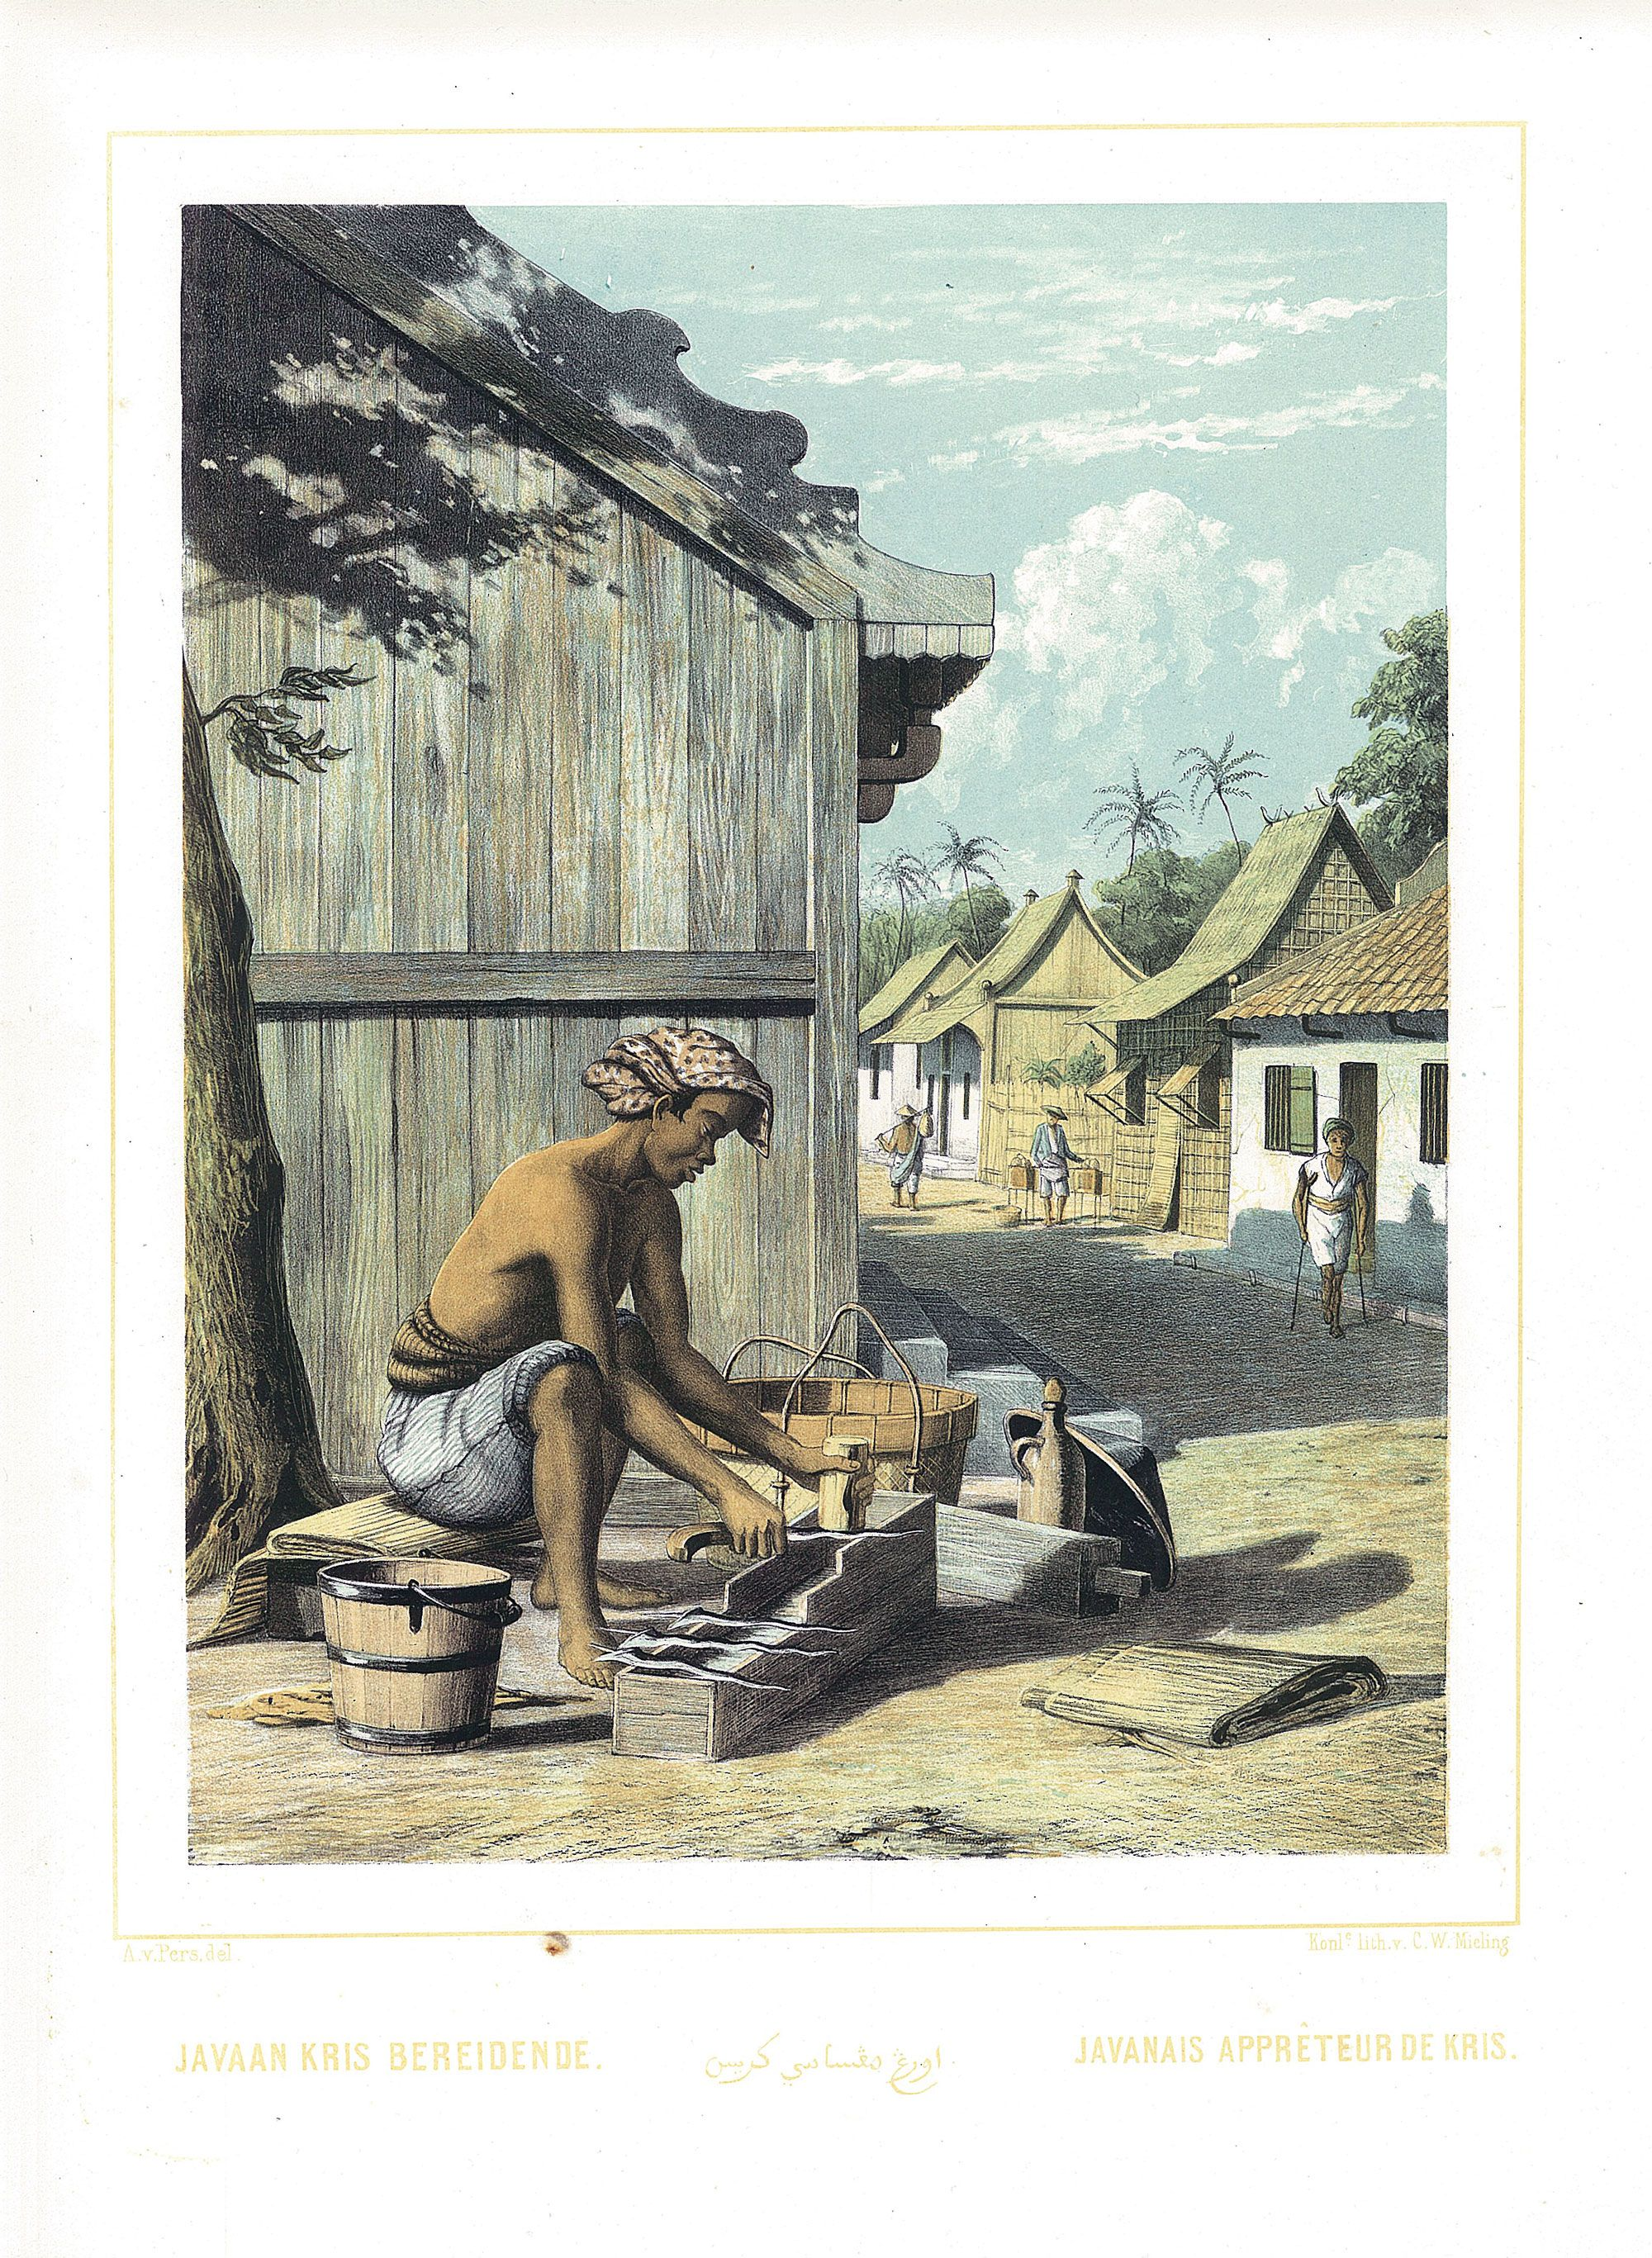 Javaan Kris Bereidende ( Van Pers 1853 ) Javaan Kris Bereidende / Javanais appreteur de Kris A rare and much sought after coloured lithograph print by Auguste van Pers (1815-71), from original drawings by the...